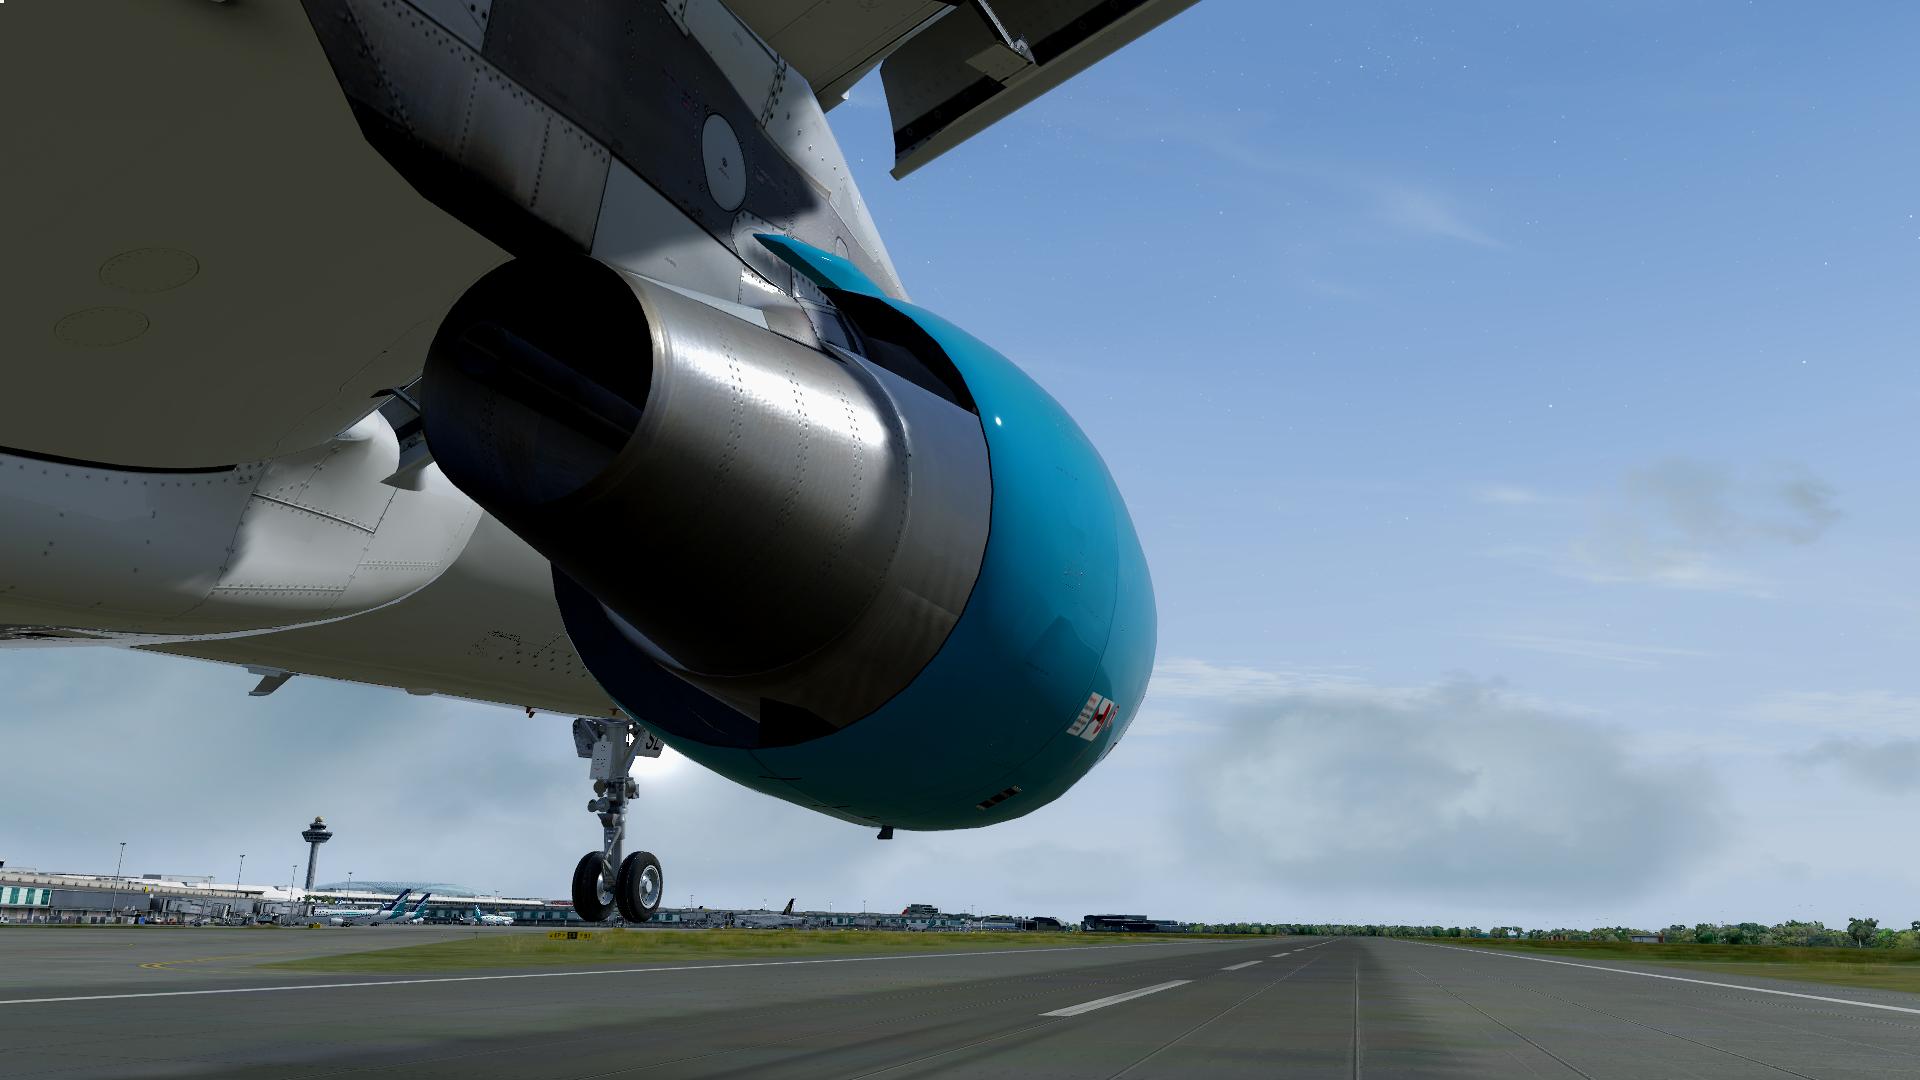 TOMATOSHADE REFLECTION PROFILES | chrisosbakk, flightsimmer